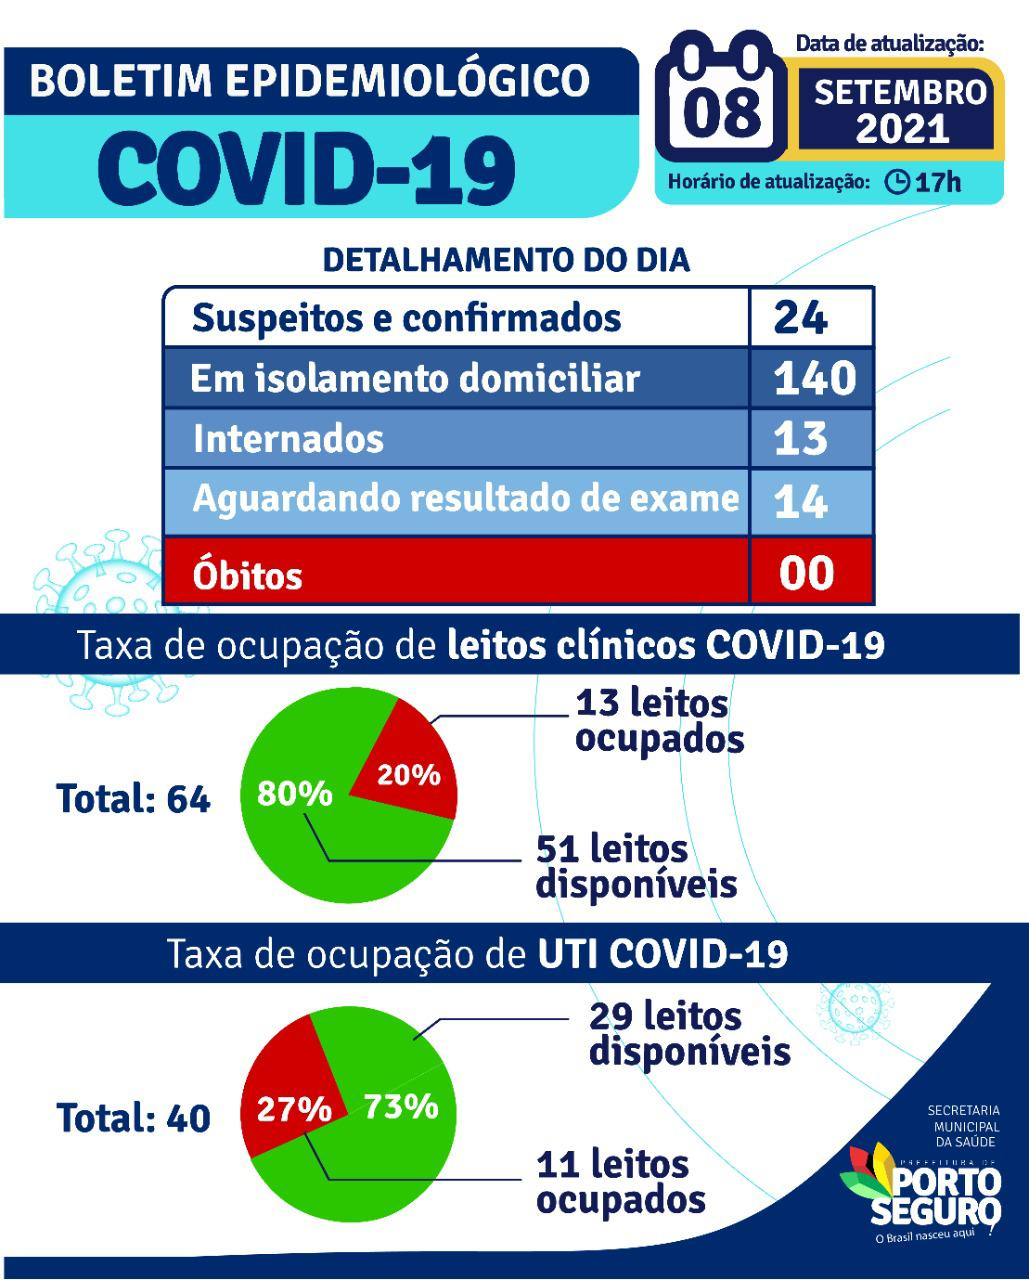 Porto Seguro: Boletim Epidemiológico Covid-19 (08 de Setembro) 22